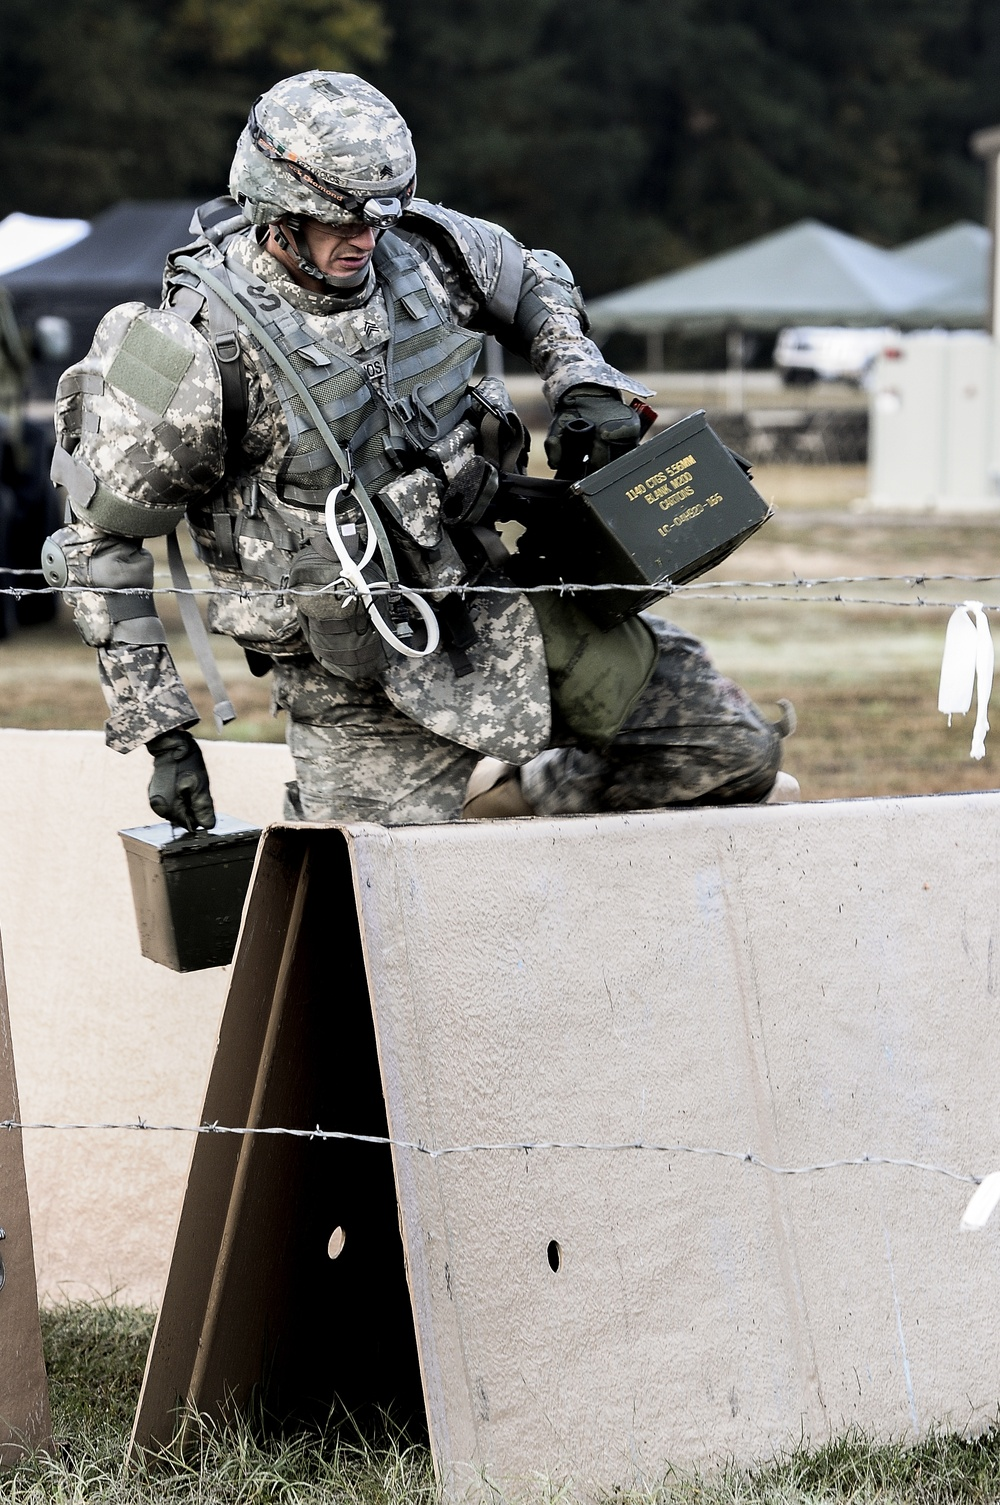 Sgt. Darius Kryzwonos navigates a stress shoot course